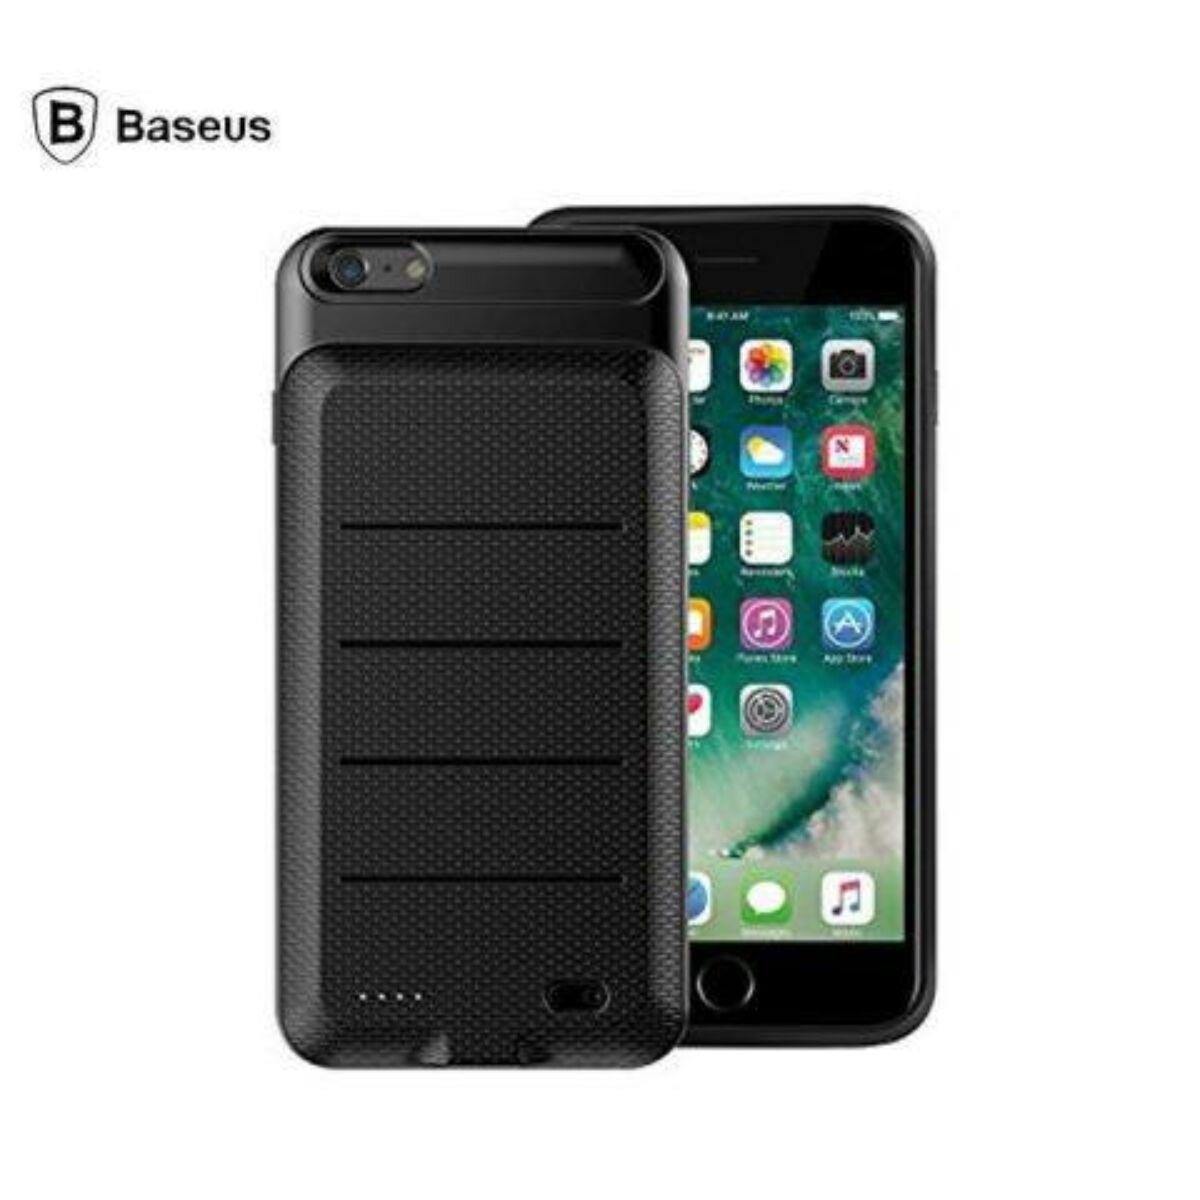 Baseus Power Bank tok, Ample Backpack 3600 mAh iPhone 6/6s Plus, fekete (ACAPIPH6SP-XB01)